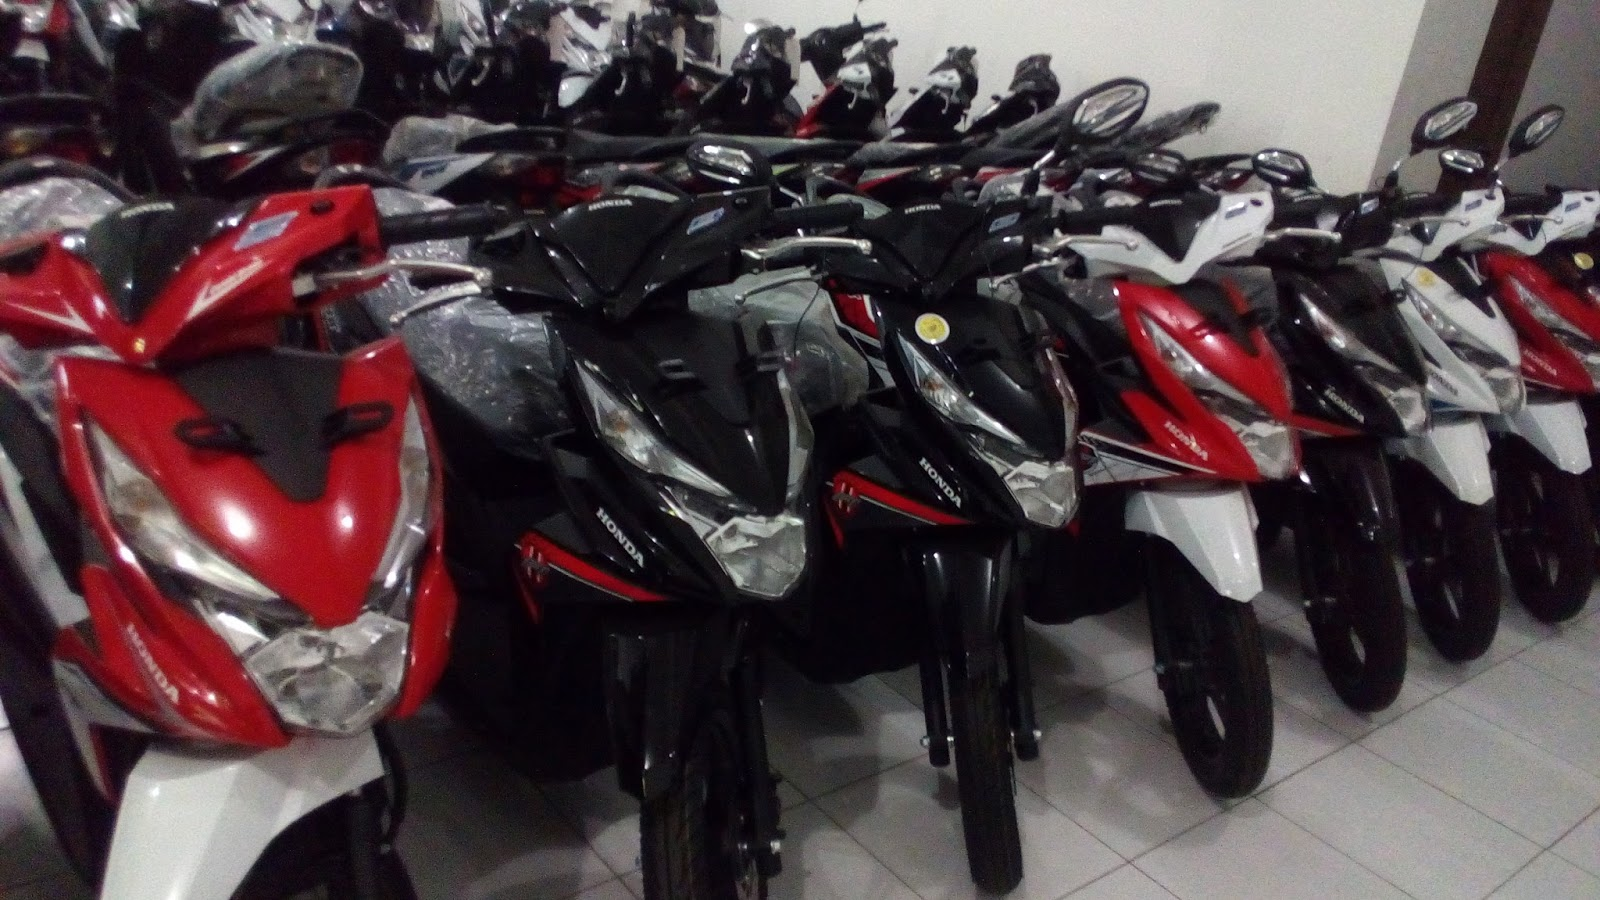 Kredit Sepeda Honda Beat All New Sporty Esp Cw Hard Rock Black Sragen Motor Kota